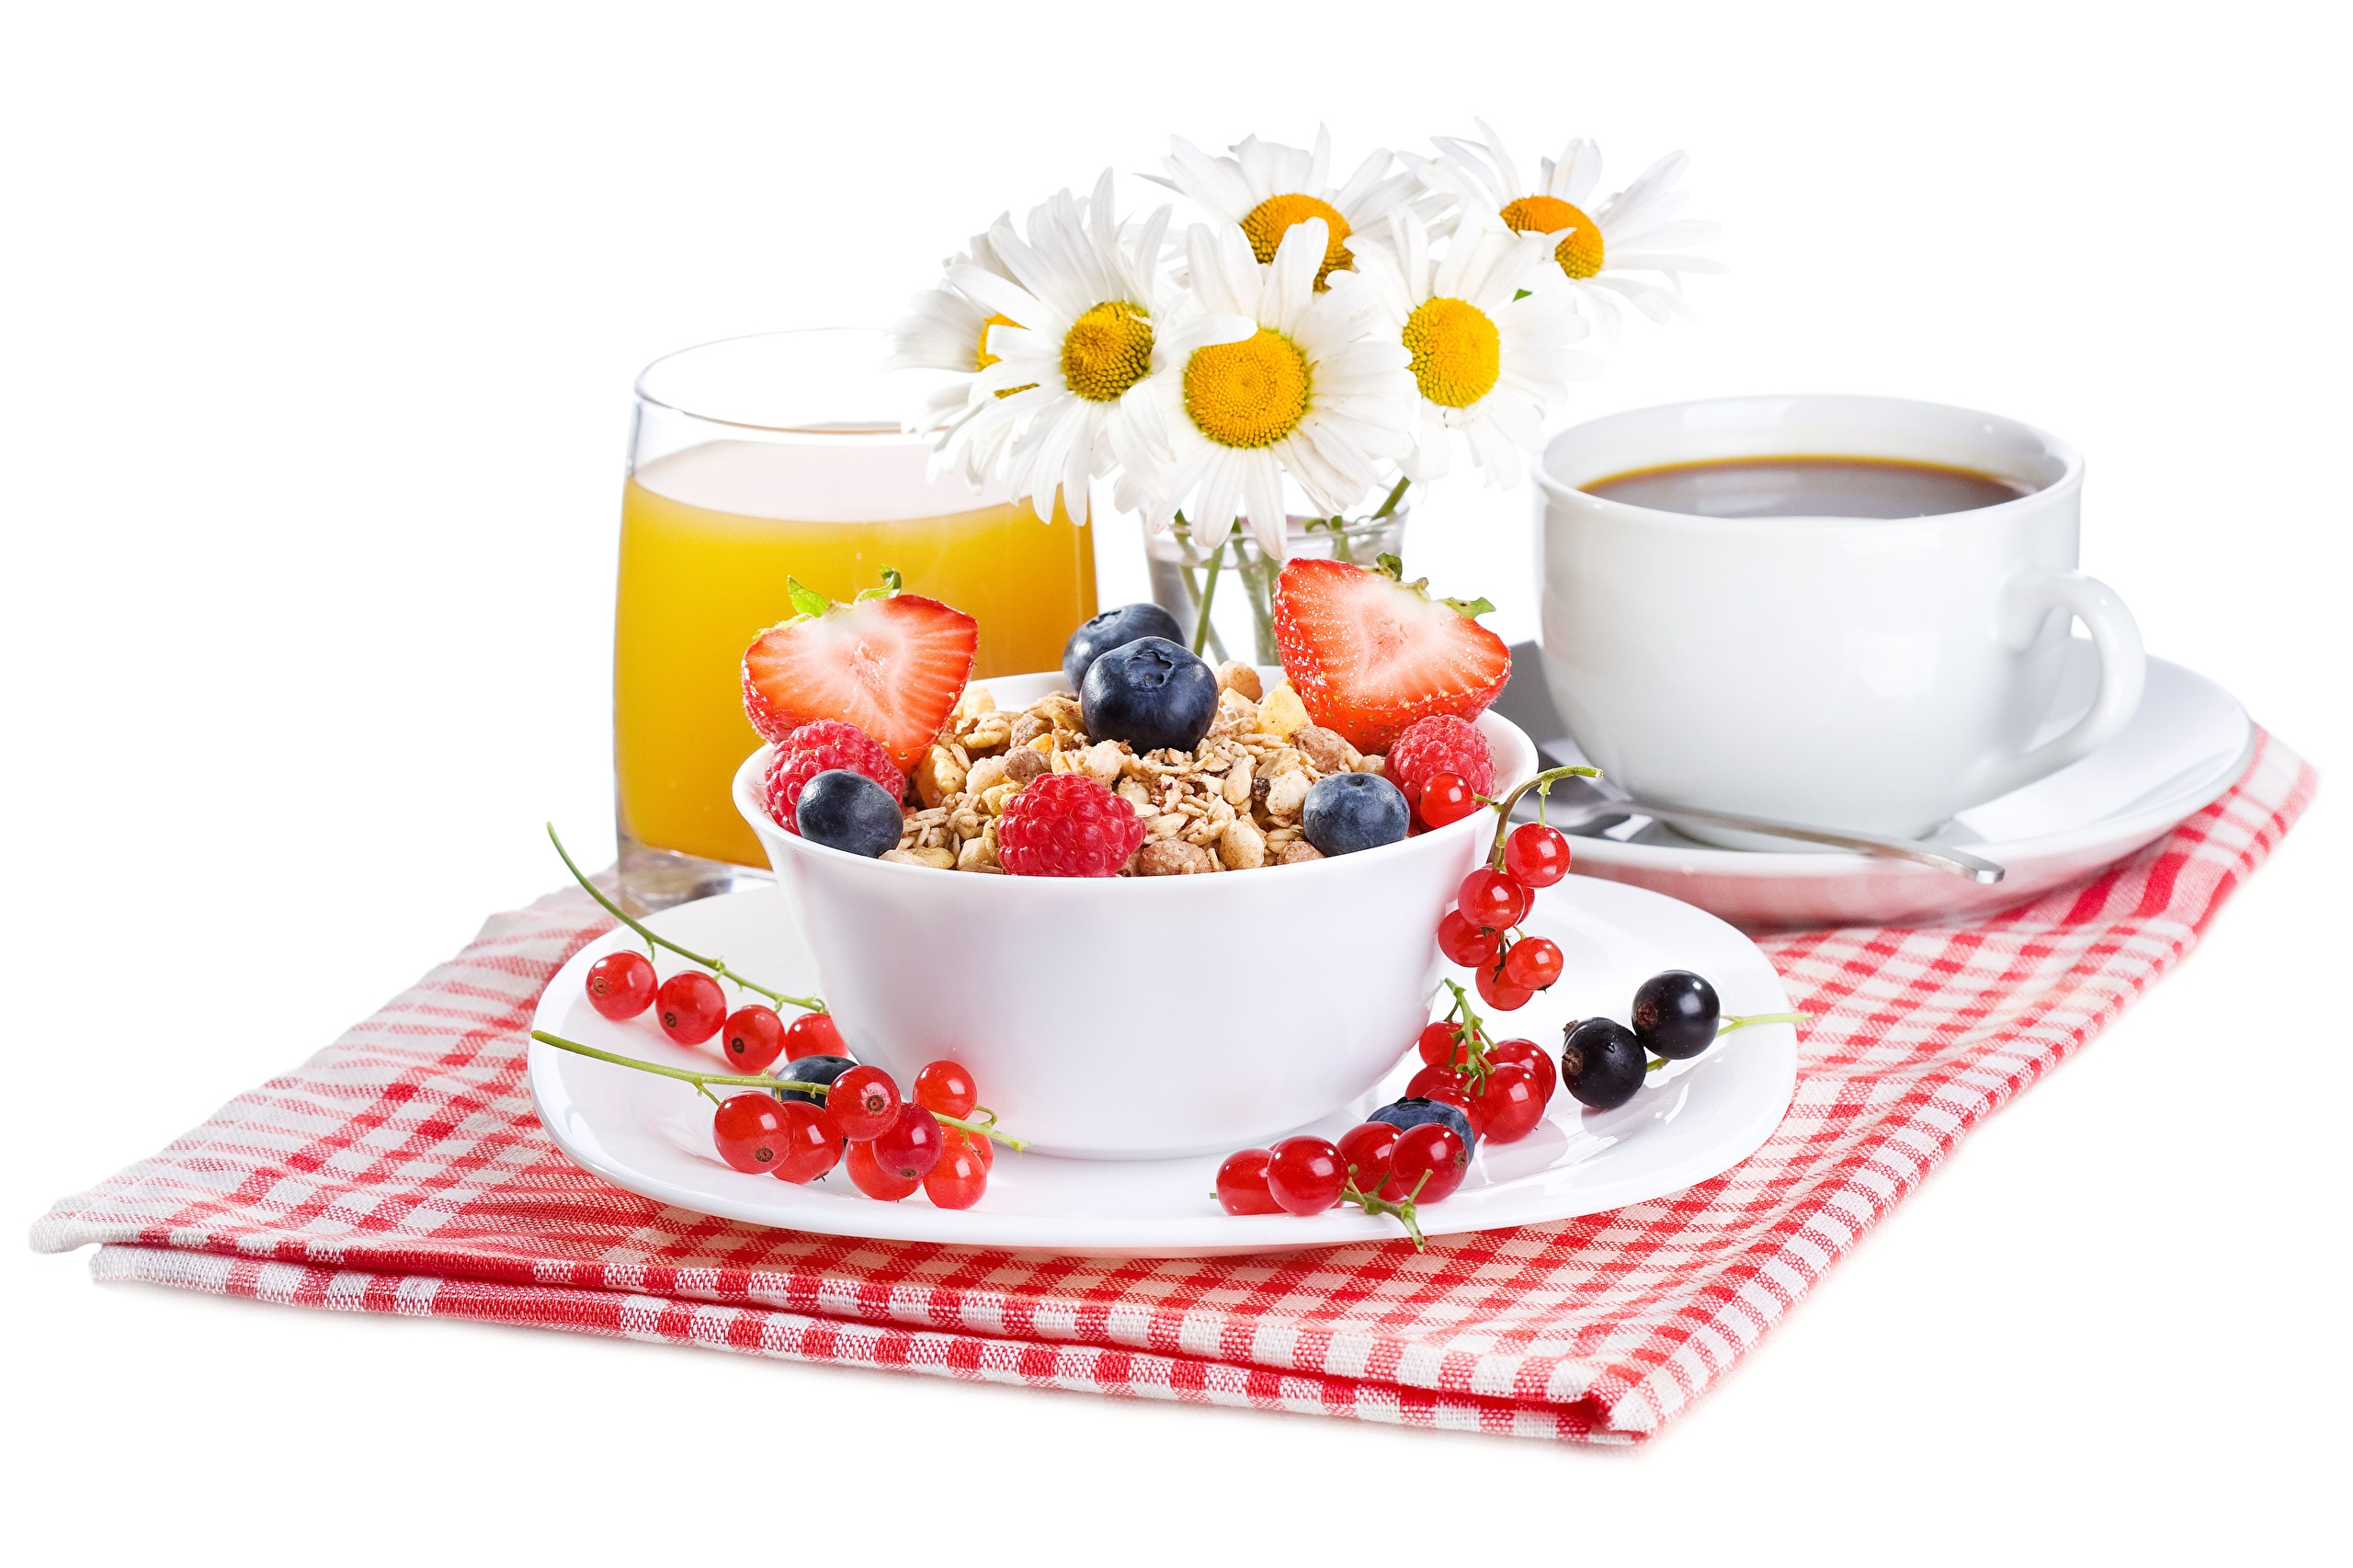 хлопья завтрак виноград flakes Breakfast grapes бесплатно